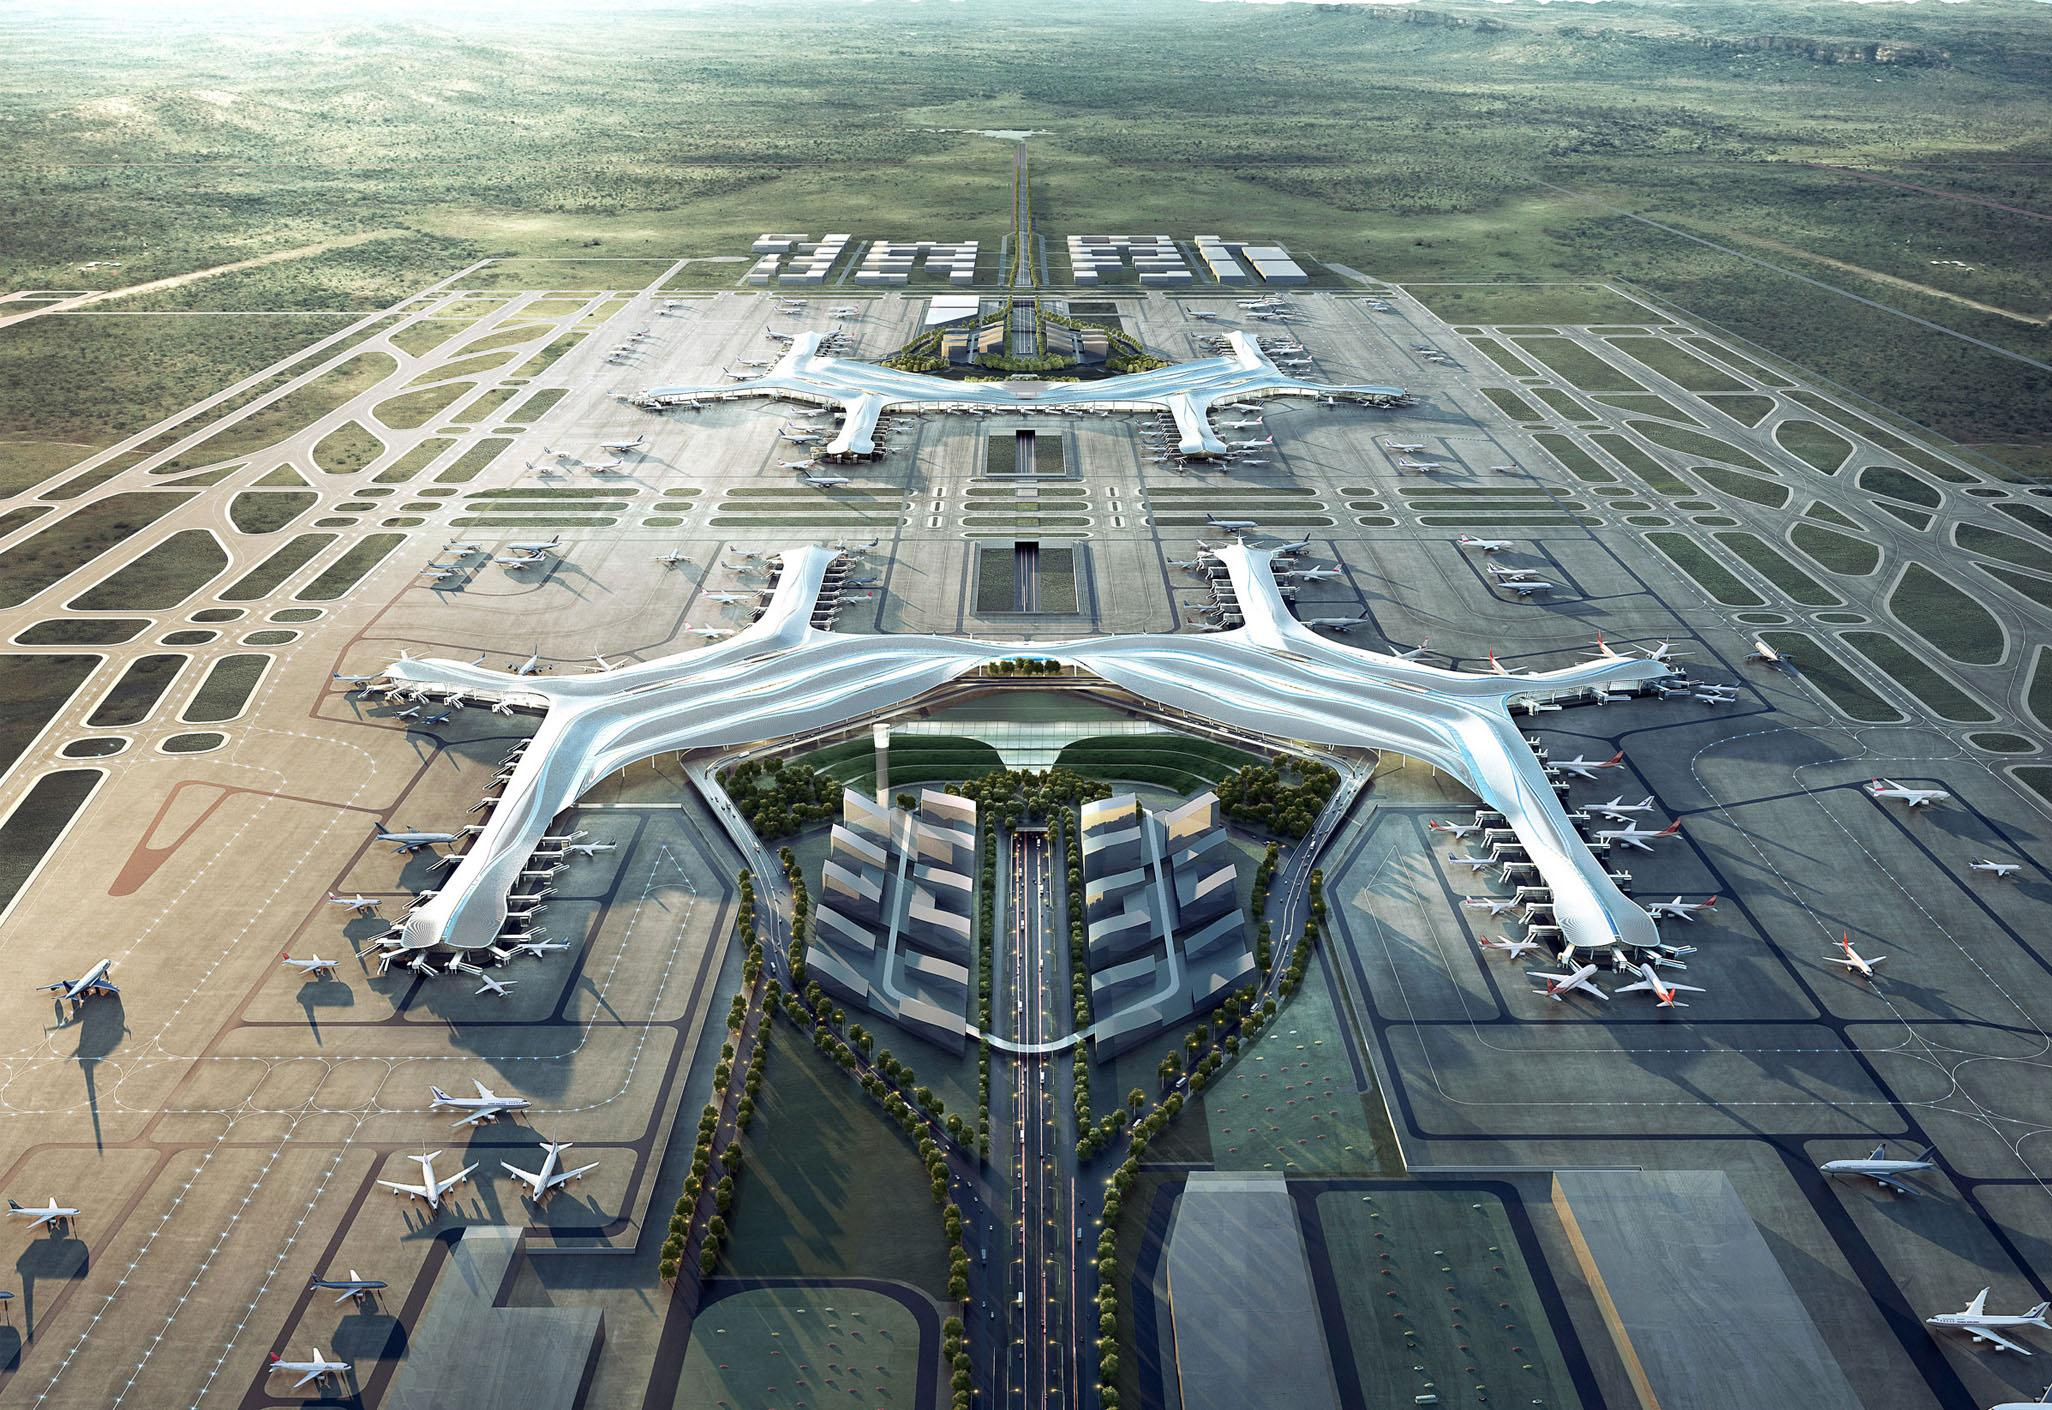 Chengdu Tianfu International Airport (TFU) i Kina. (Foto: chengdu-expat.com)